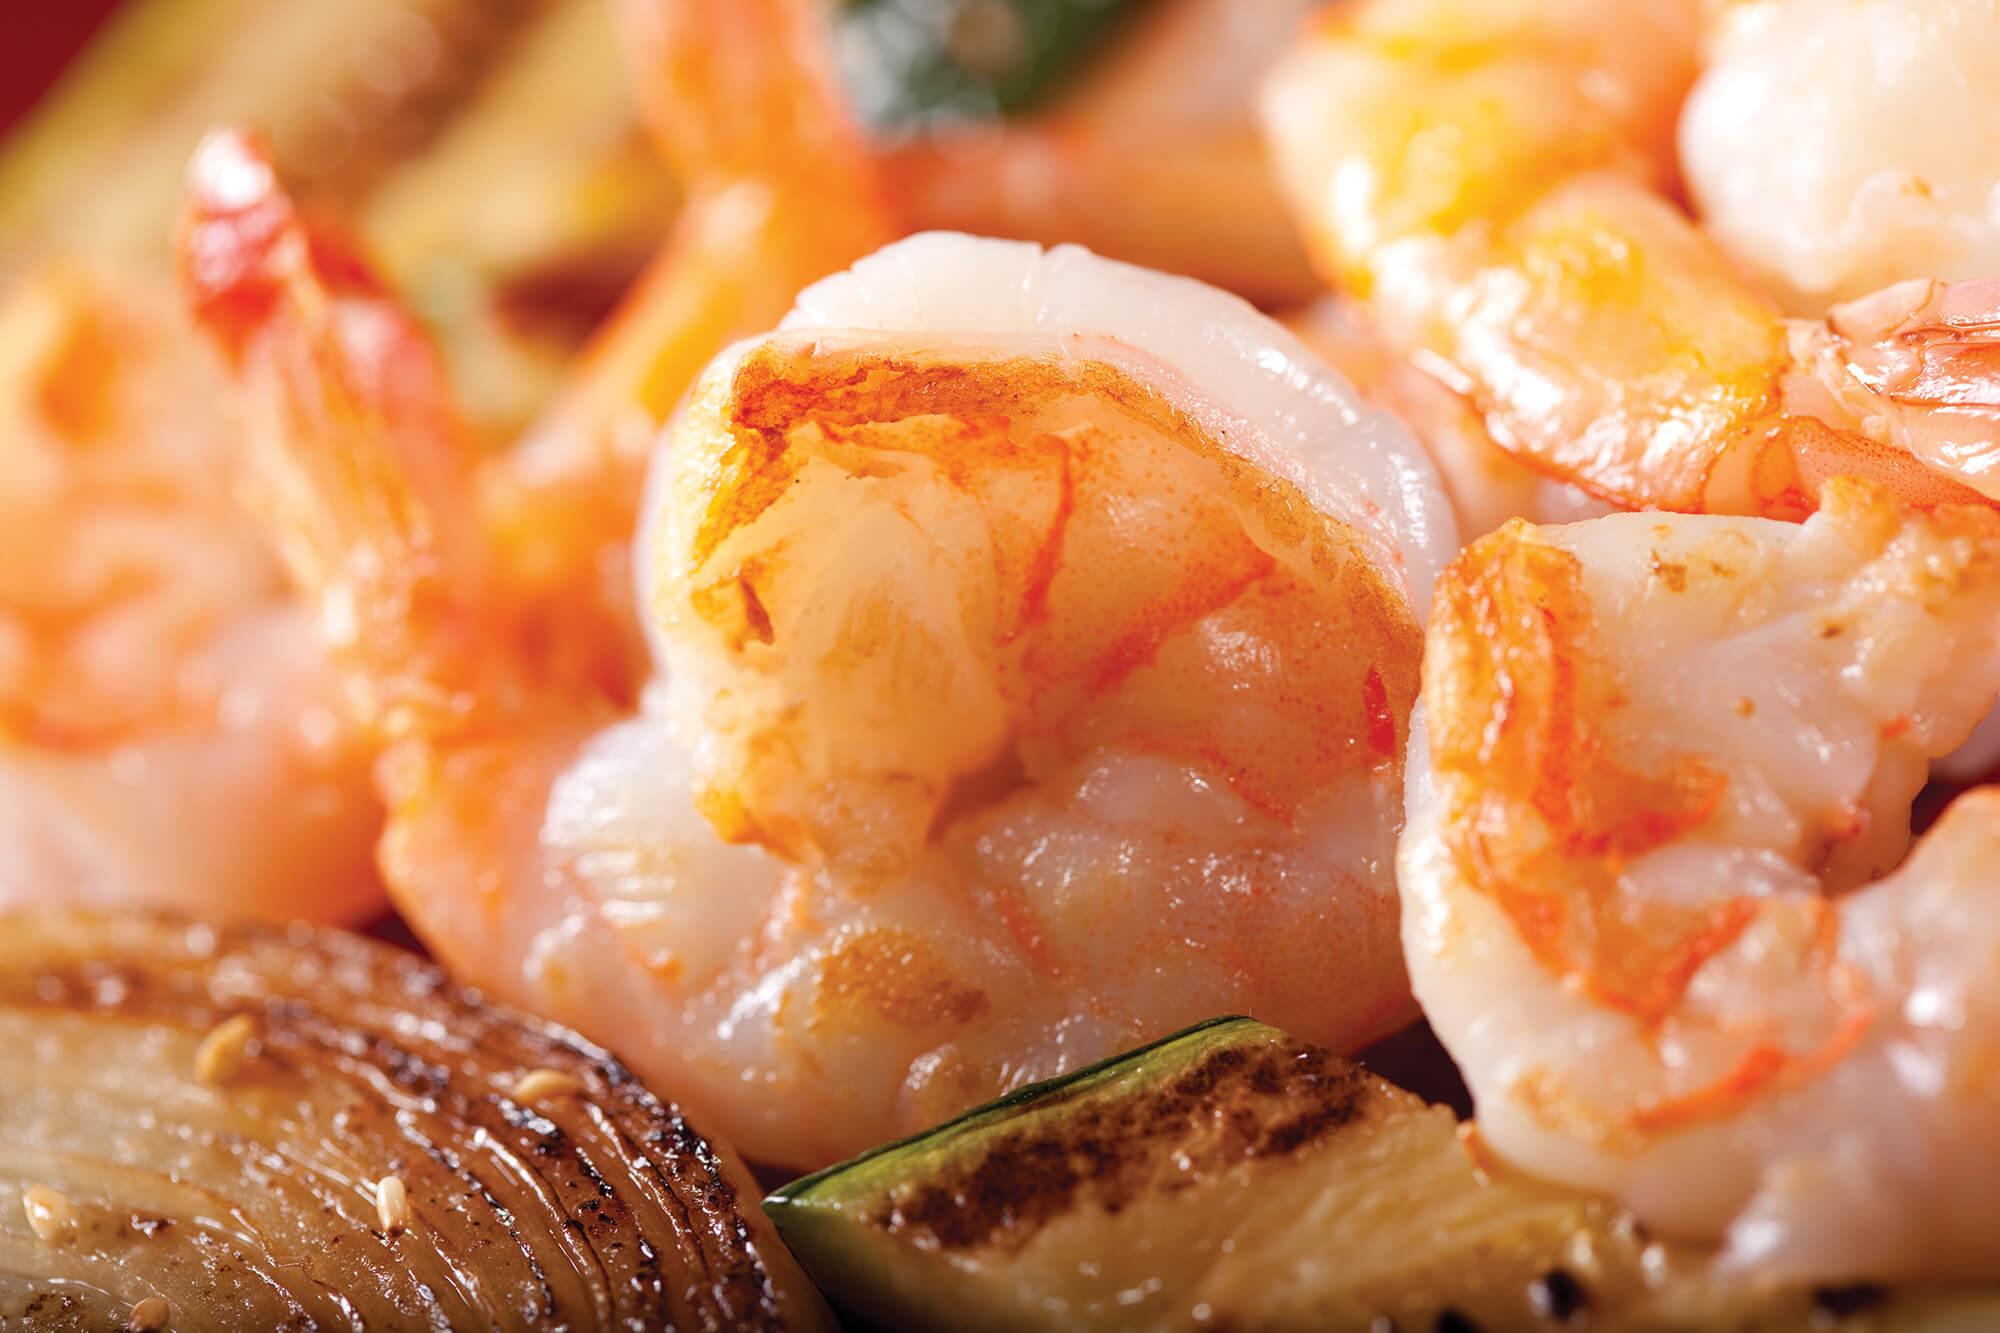 Food Photo Gallery - View Benihana's Delicious Menu | Benihana